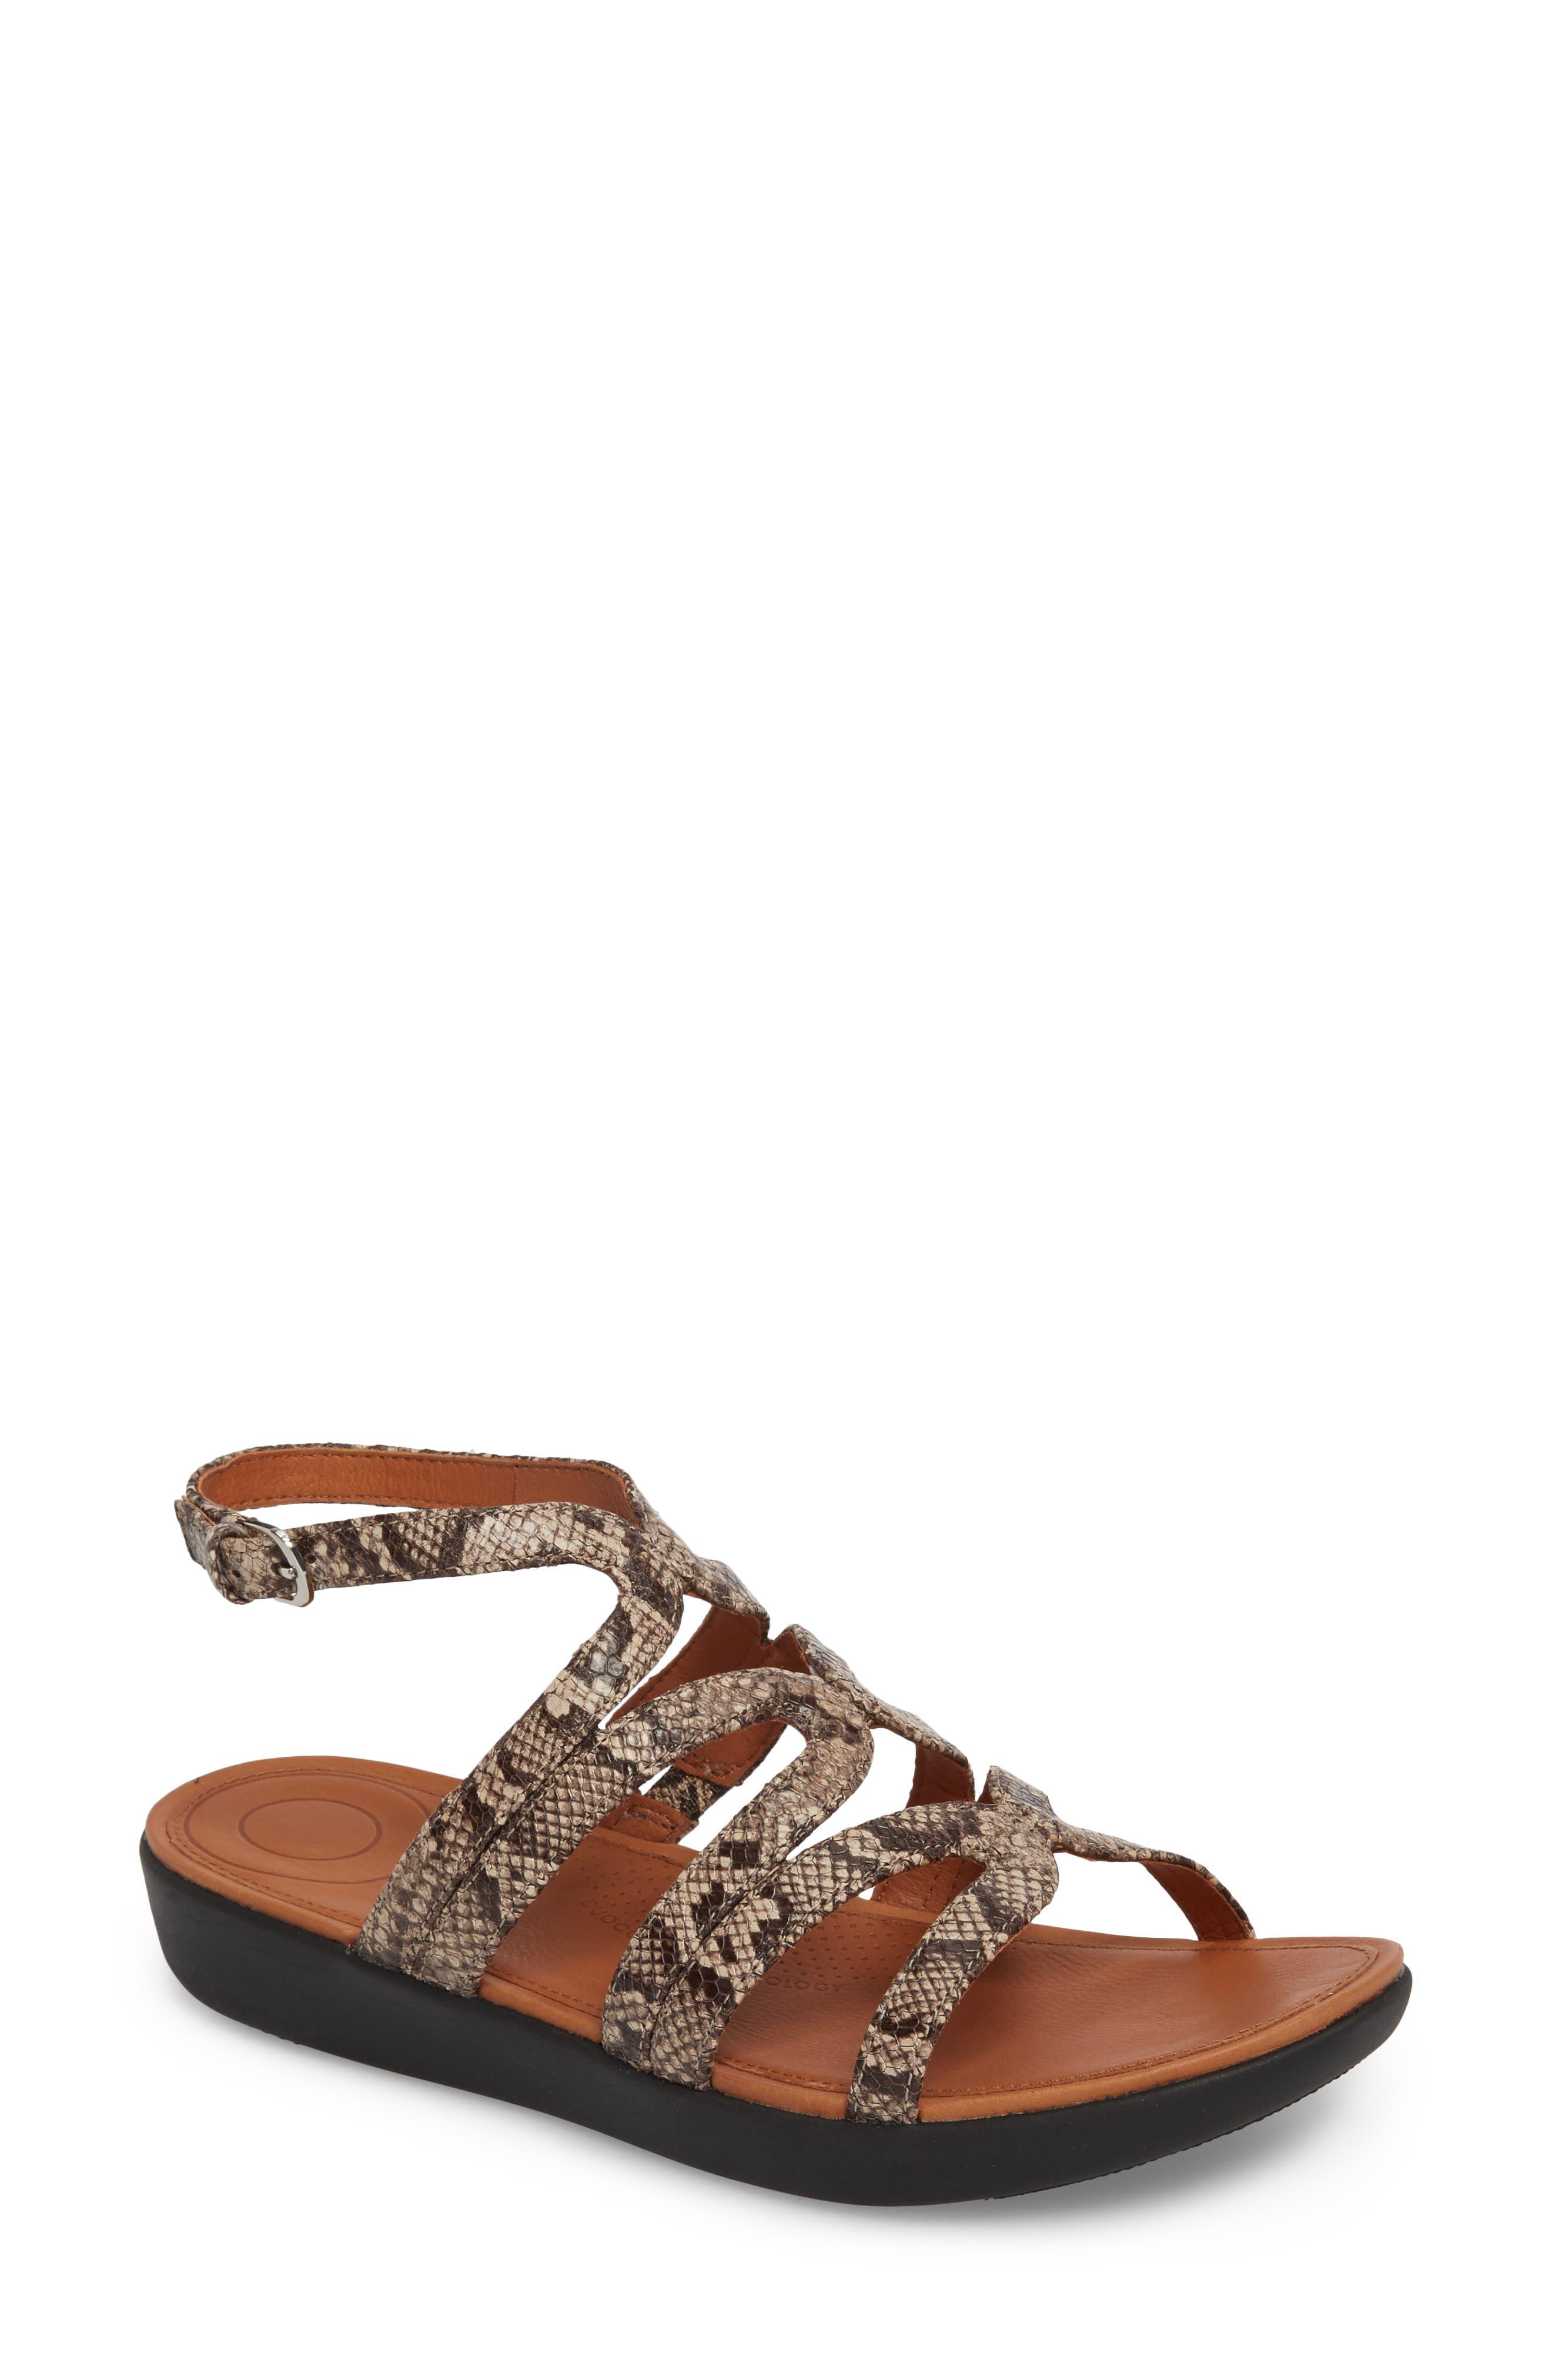 Strata Gladiator Sandal,                         Main,                         color, Taupe Snake Print Leather